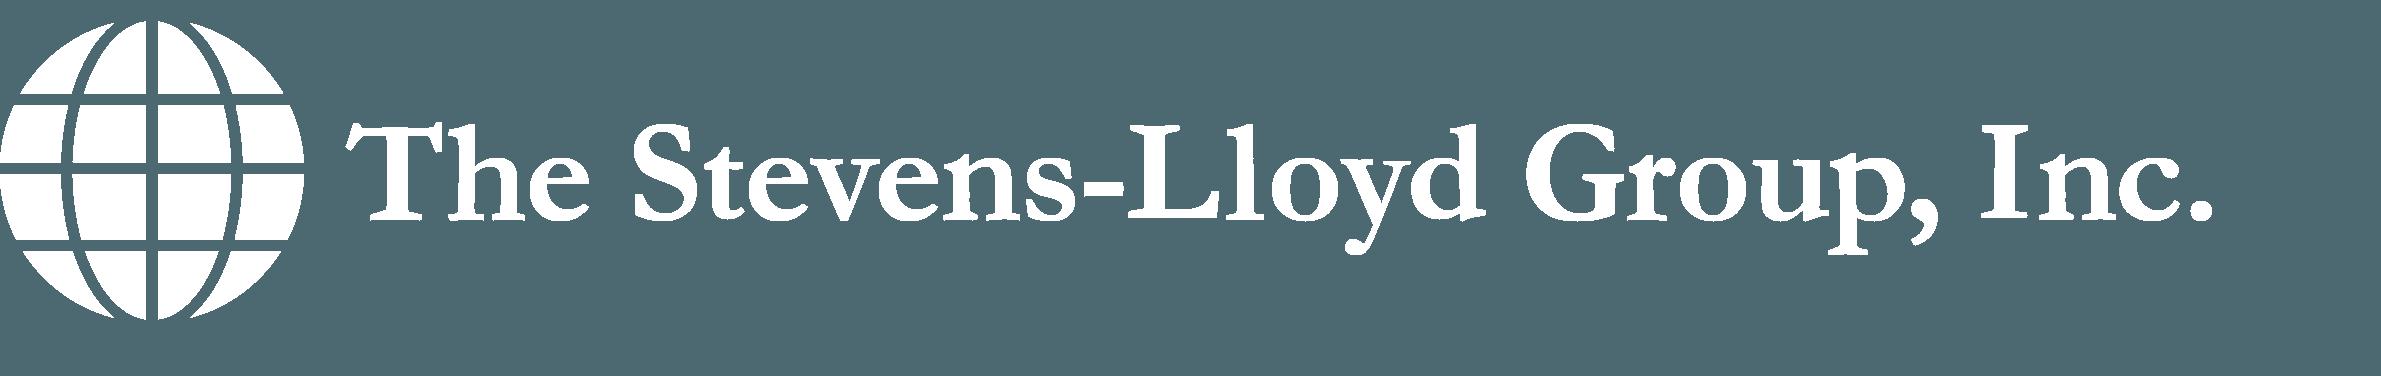 the-stevens-lloyd-group-inc-logo